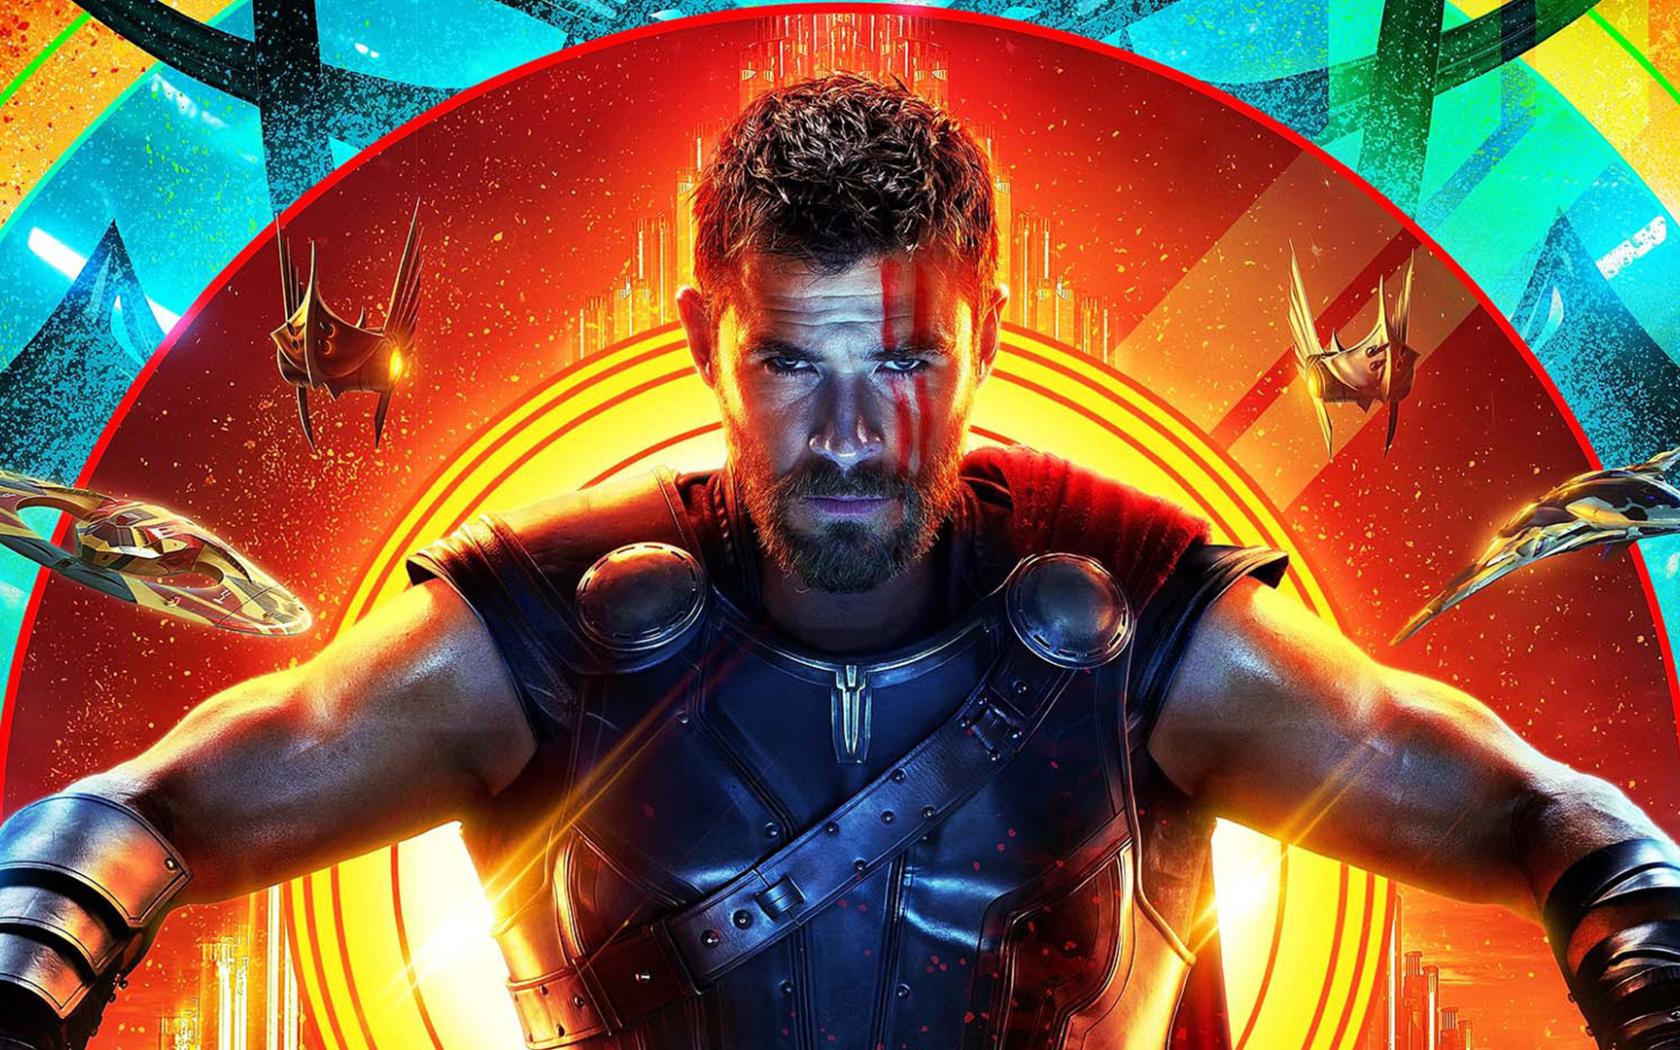 3d Thor Movie Hammer Wallpapers Hd: Chris Hemsworth As Thor, Full HD Wallpaper